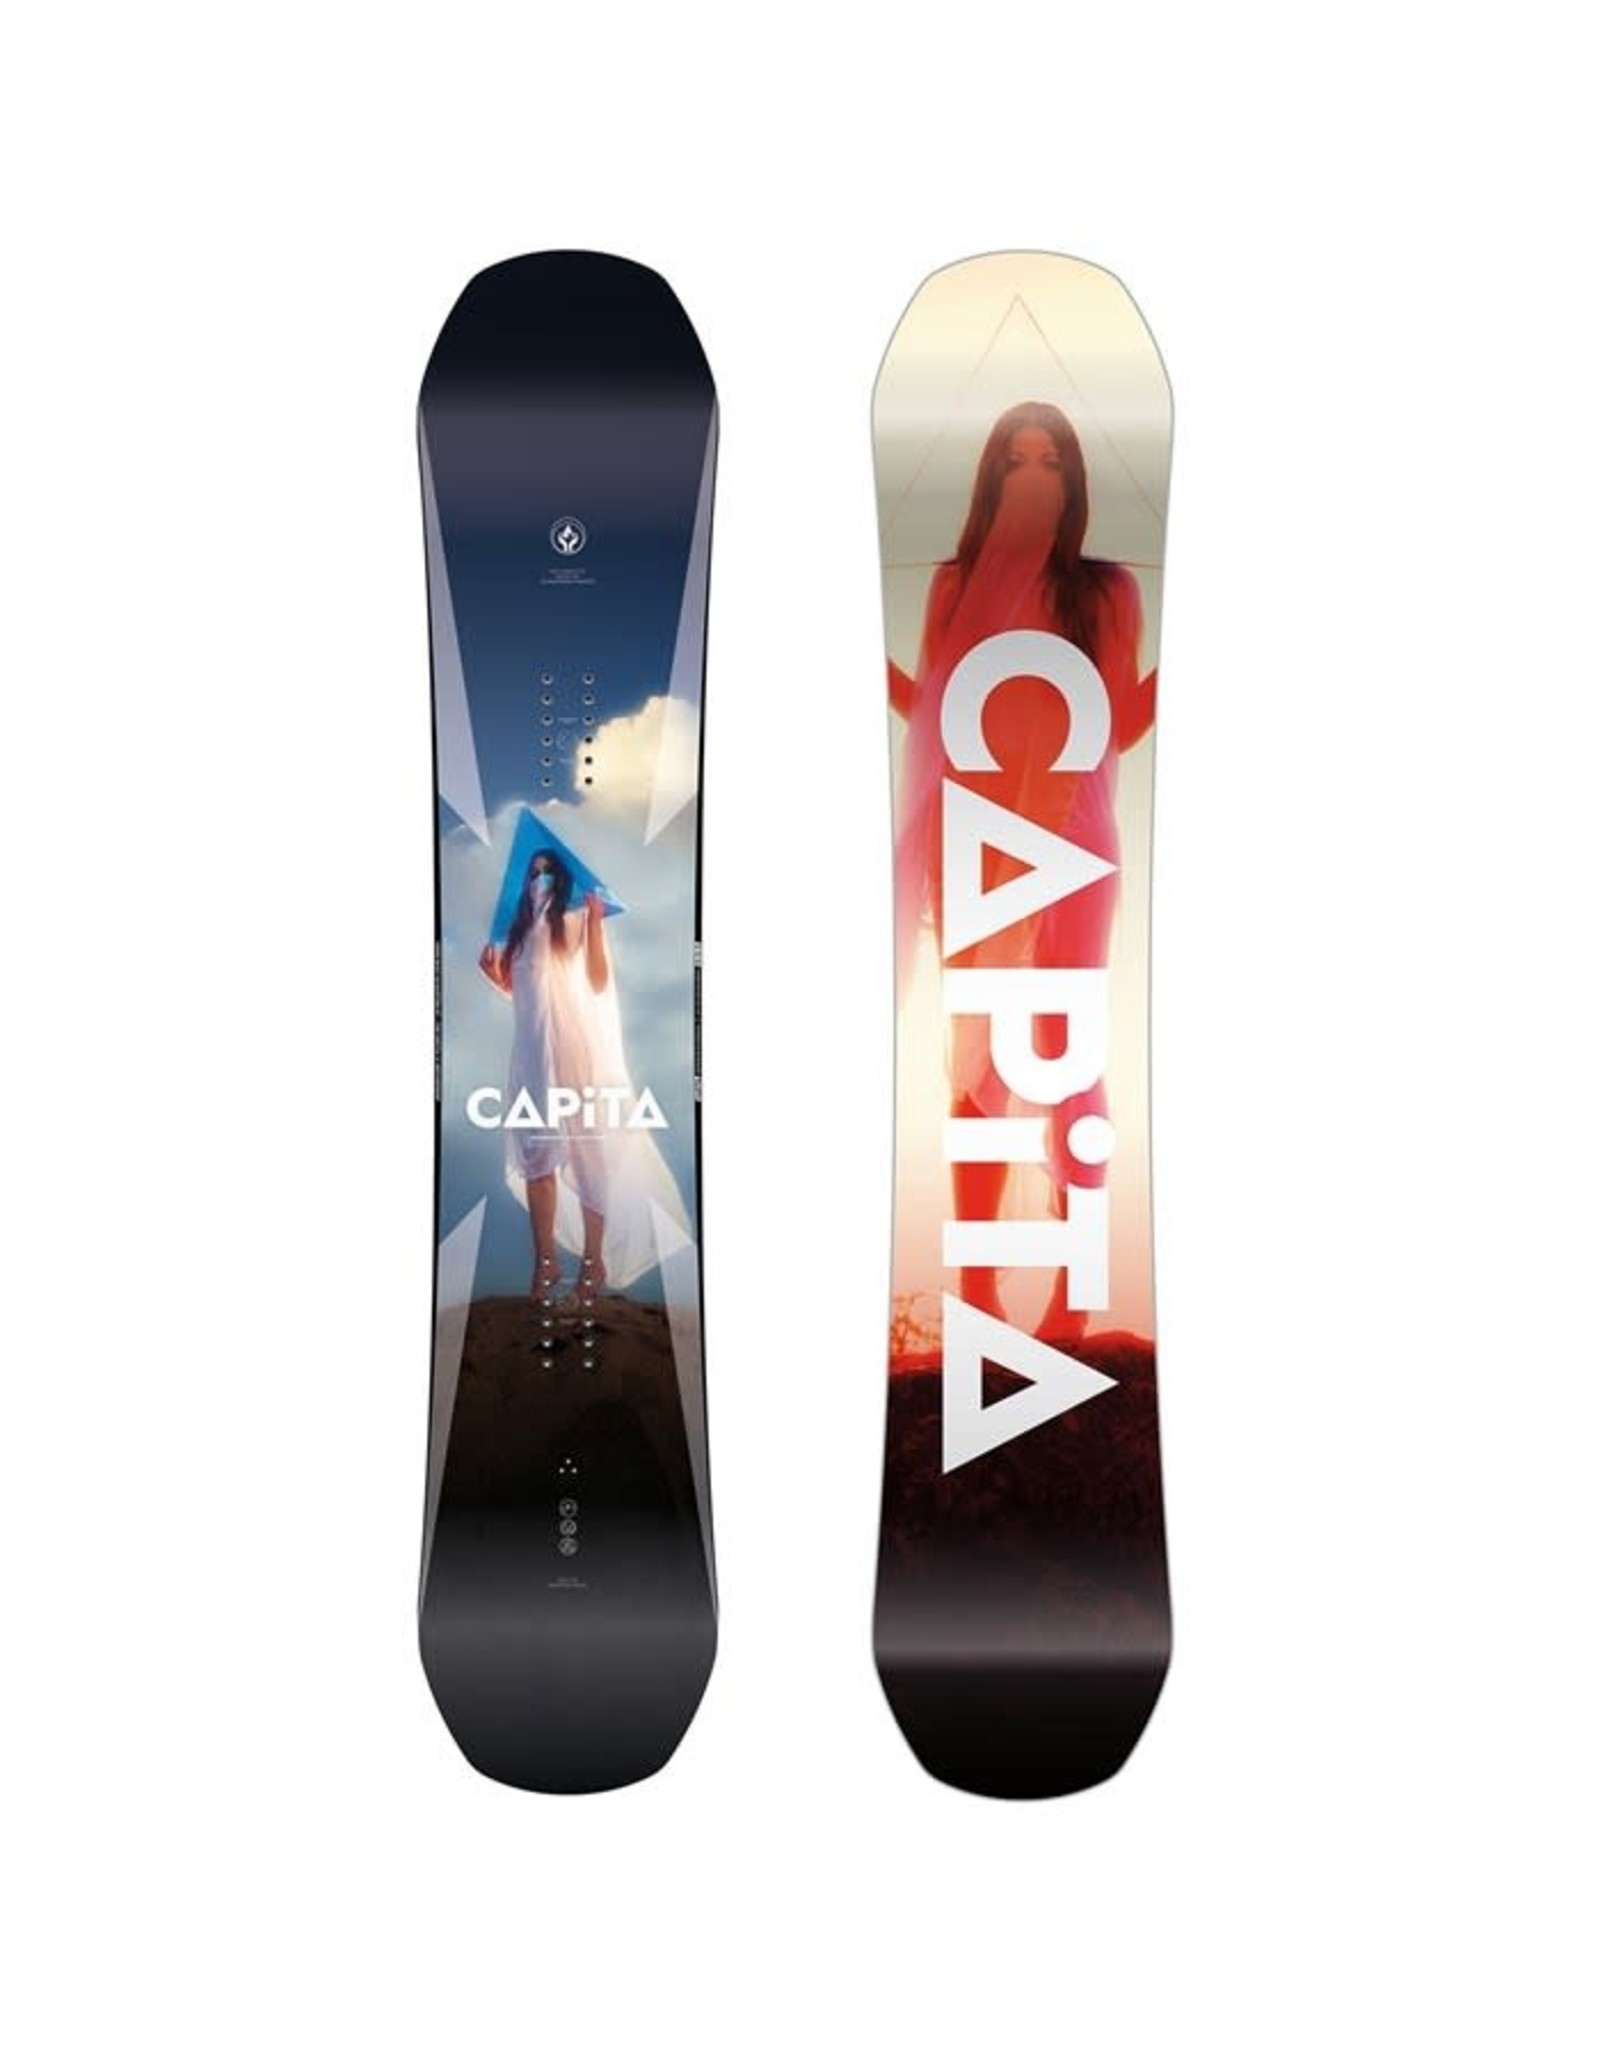 CAPITA CAPITA 2020 DEFENDERS OF AWESOME SNOWBOARD